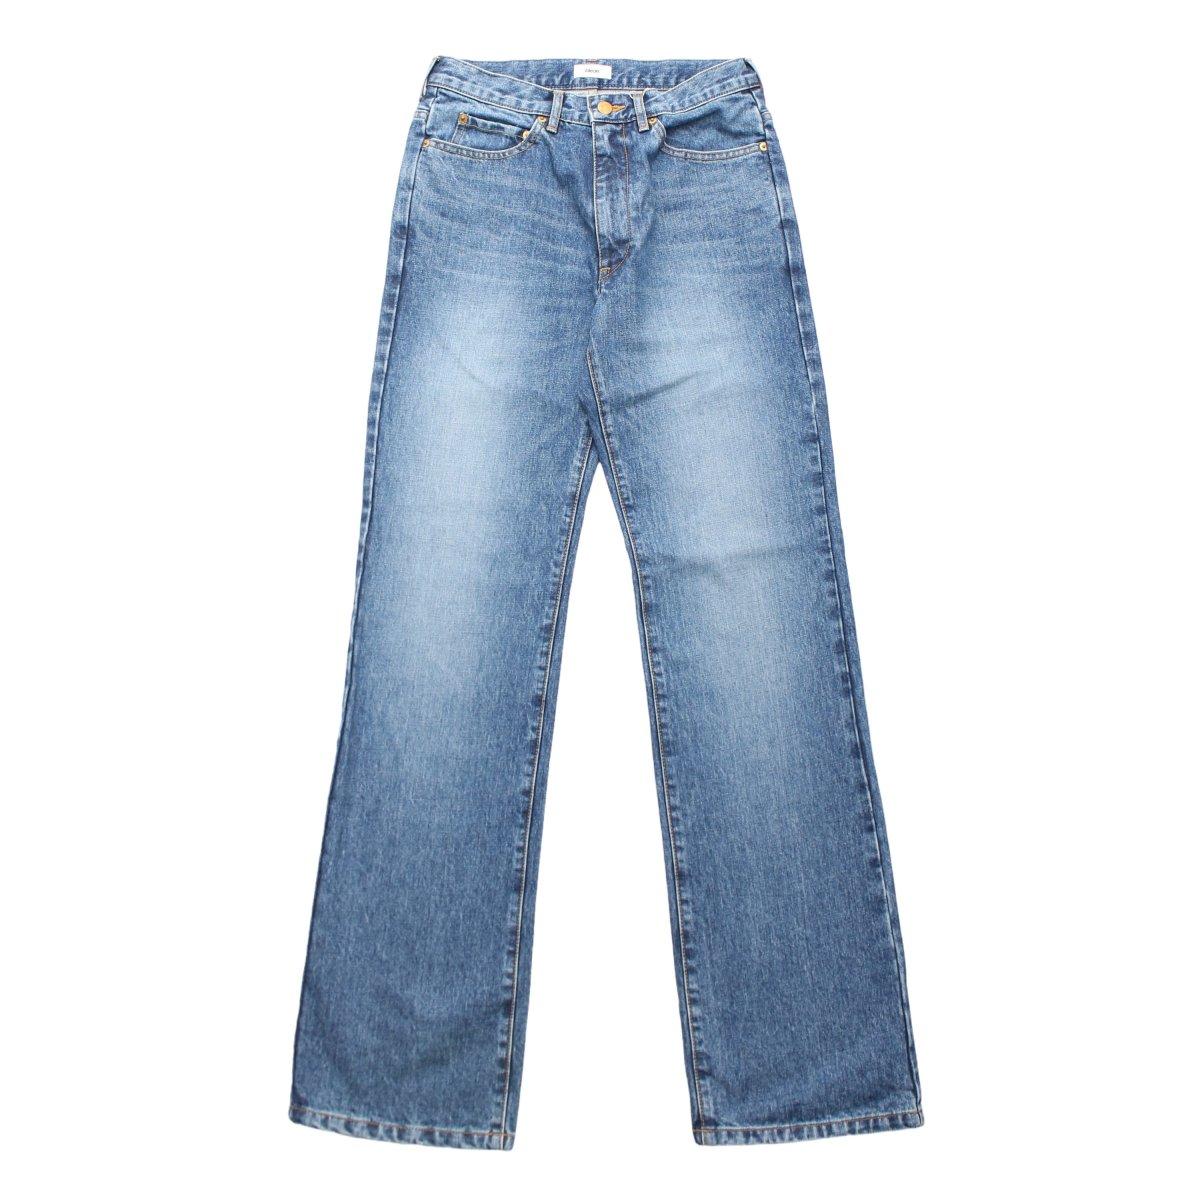 5P Flare Denim Pants